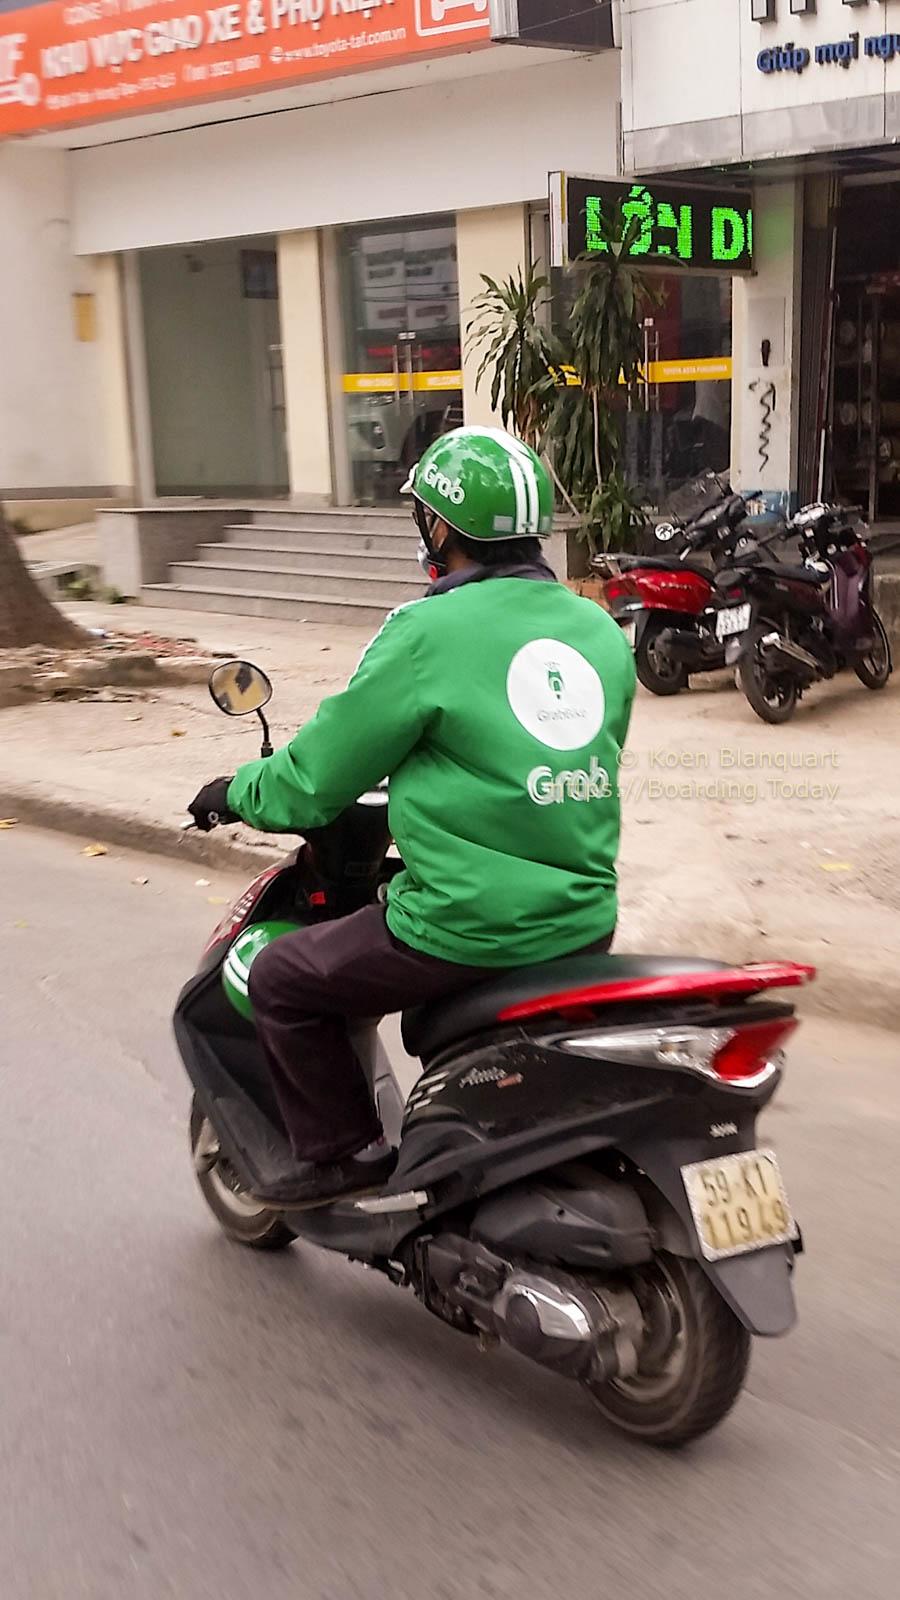 20170119-2017-01-19 14.07.41-4grab, Ho Chi Minh City, Saigon, scooter, traffic, Vietnam by Koen Blanquart for Boarding.Today.jpg